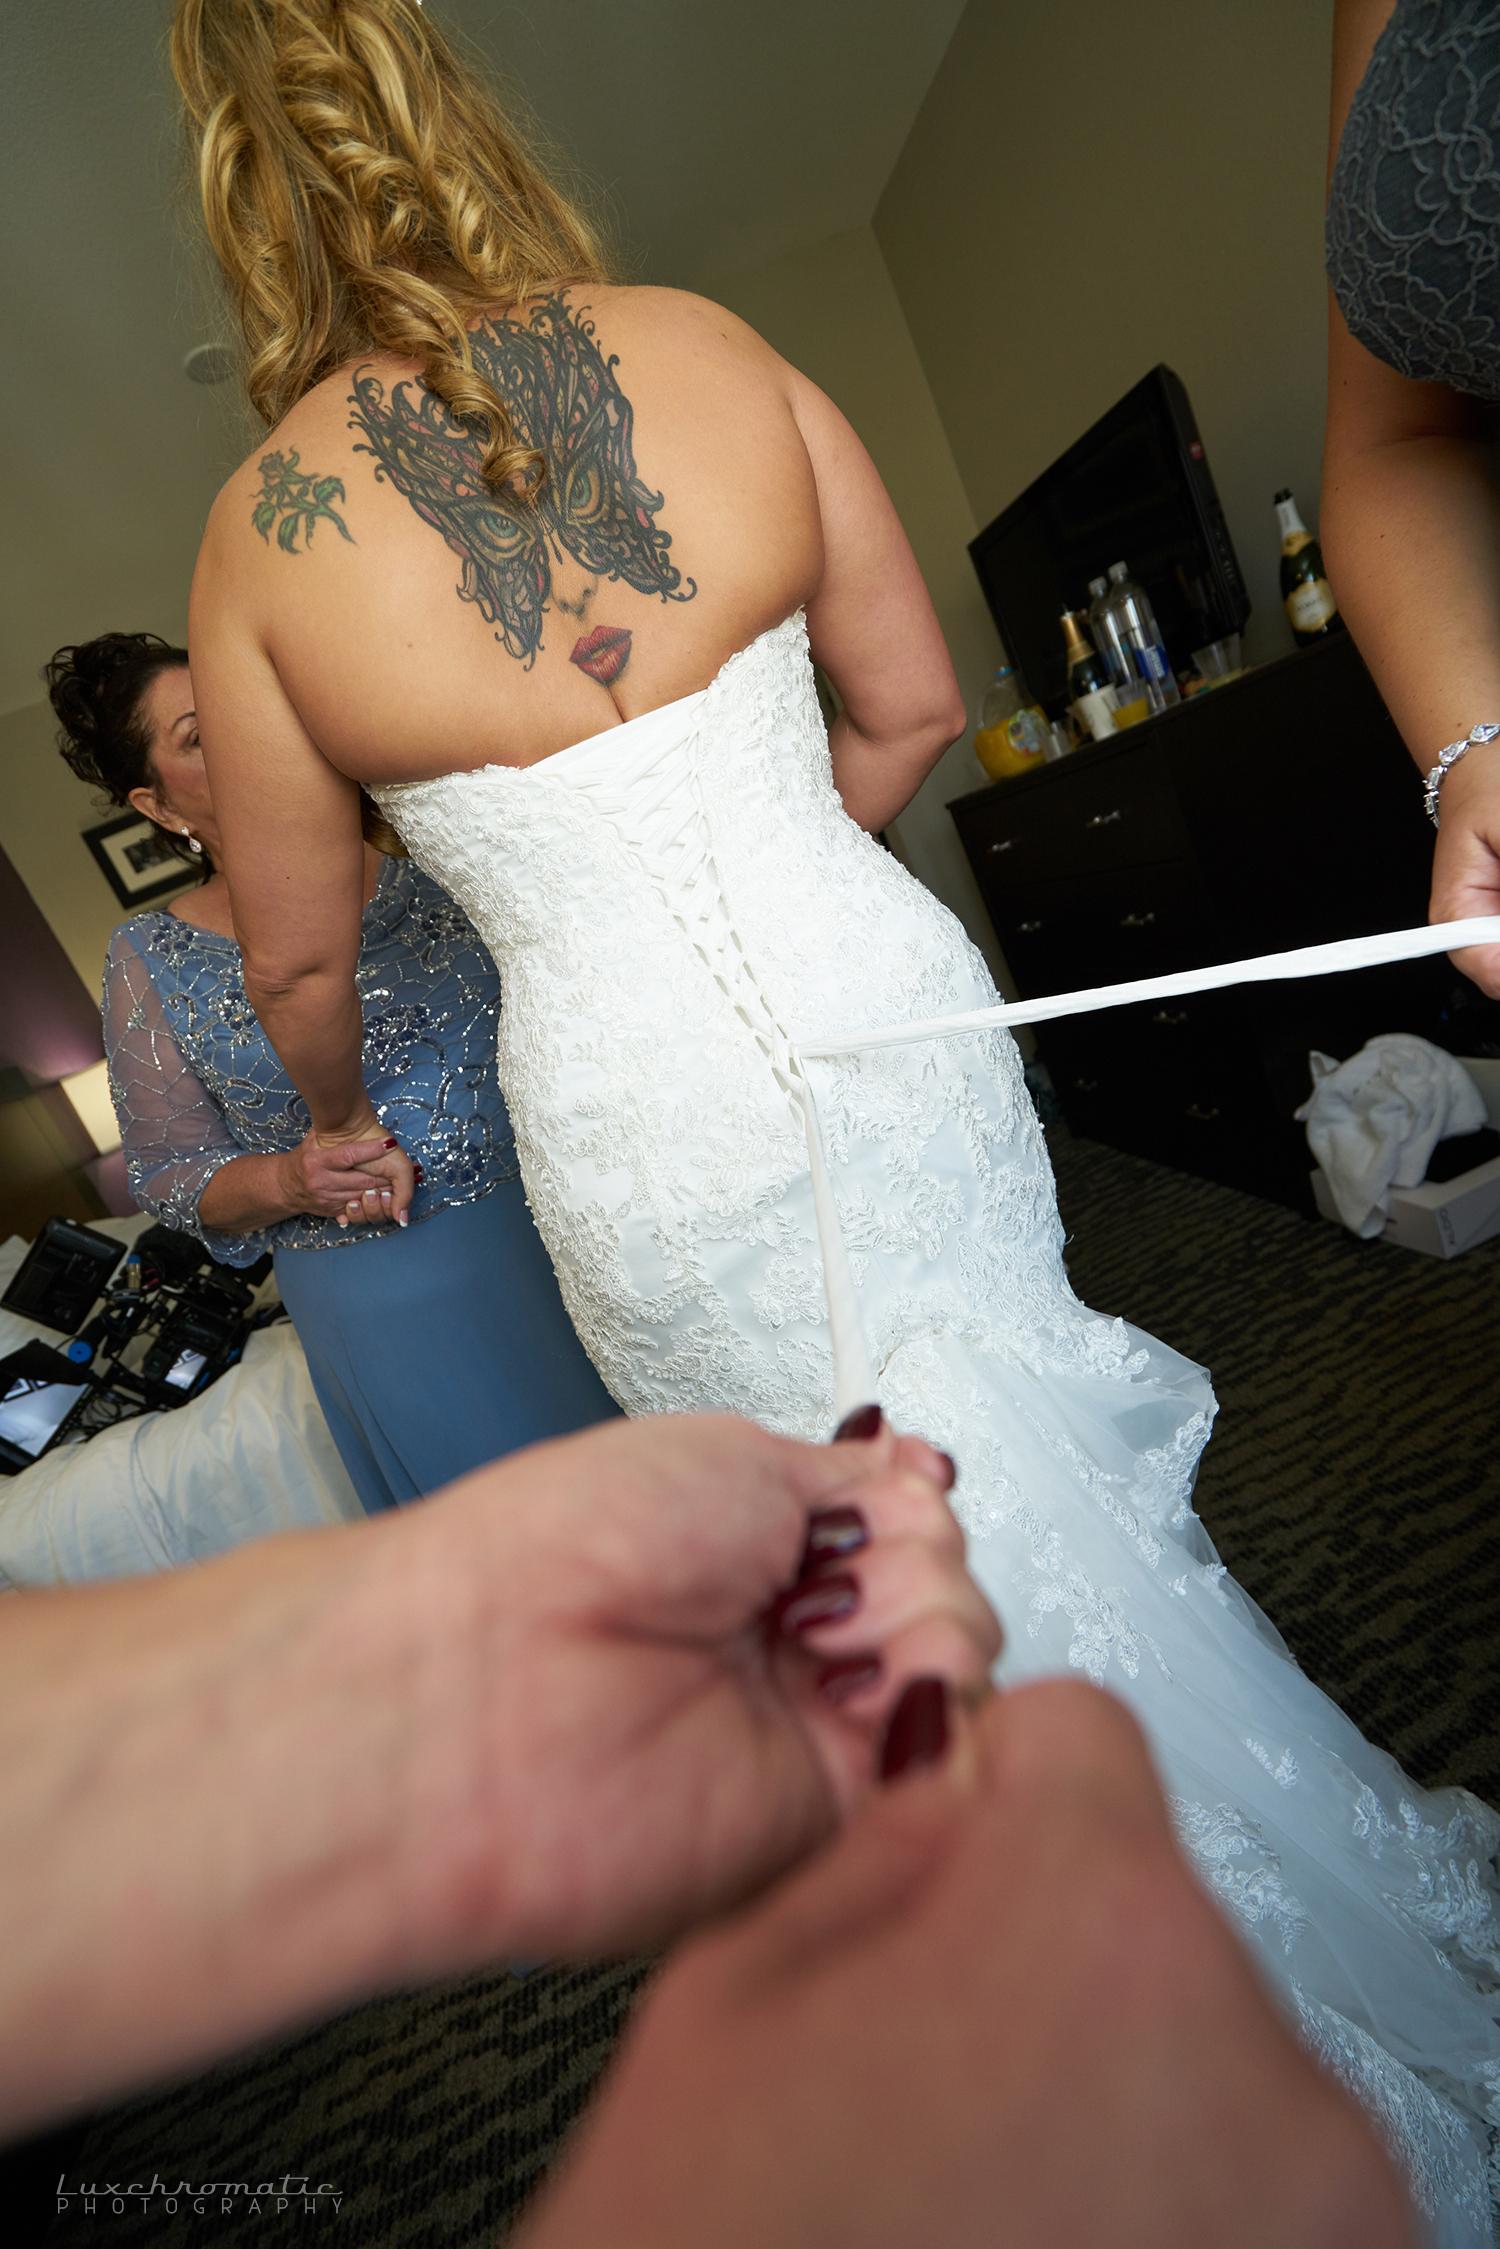 081217_Rachel_Chris_a0118-weddingdress-bride-weddingphotography-weddingphotographer-bridal-groom-wedding-engagementring-proposal-brides-diamondring-sonyalpha-sony-sonya9-sonya7rii-sanfrancisco-sf-bayarea-photographer-profoto-murrietas-well.jpg